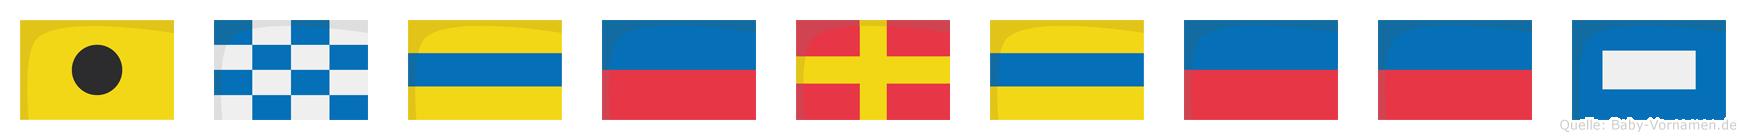 Inderdeep im Flaggenalphabet